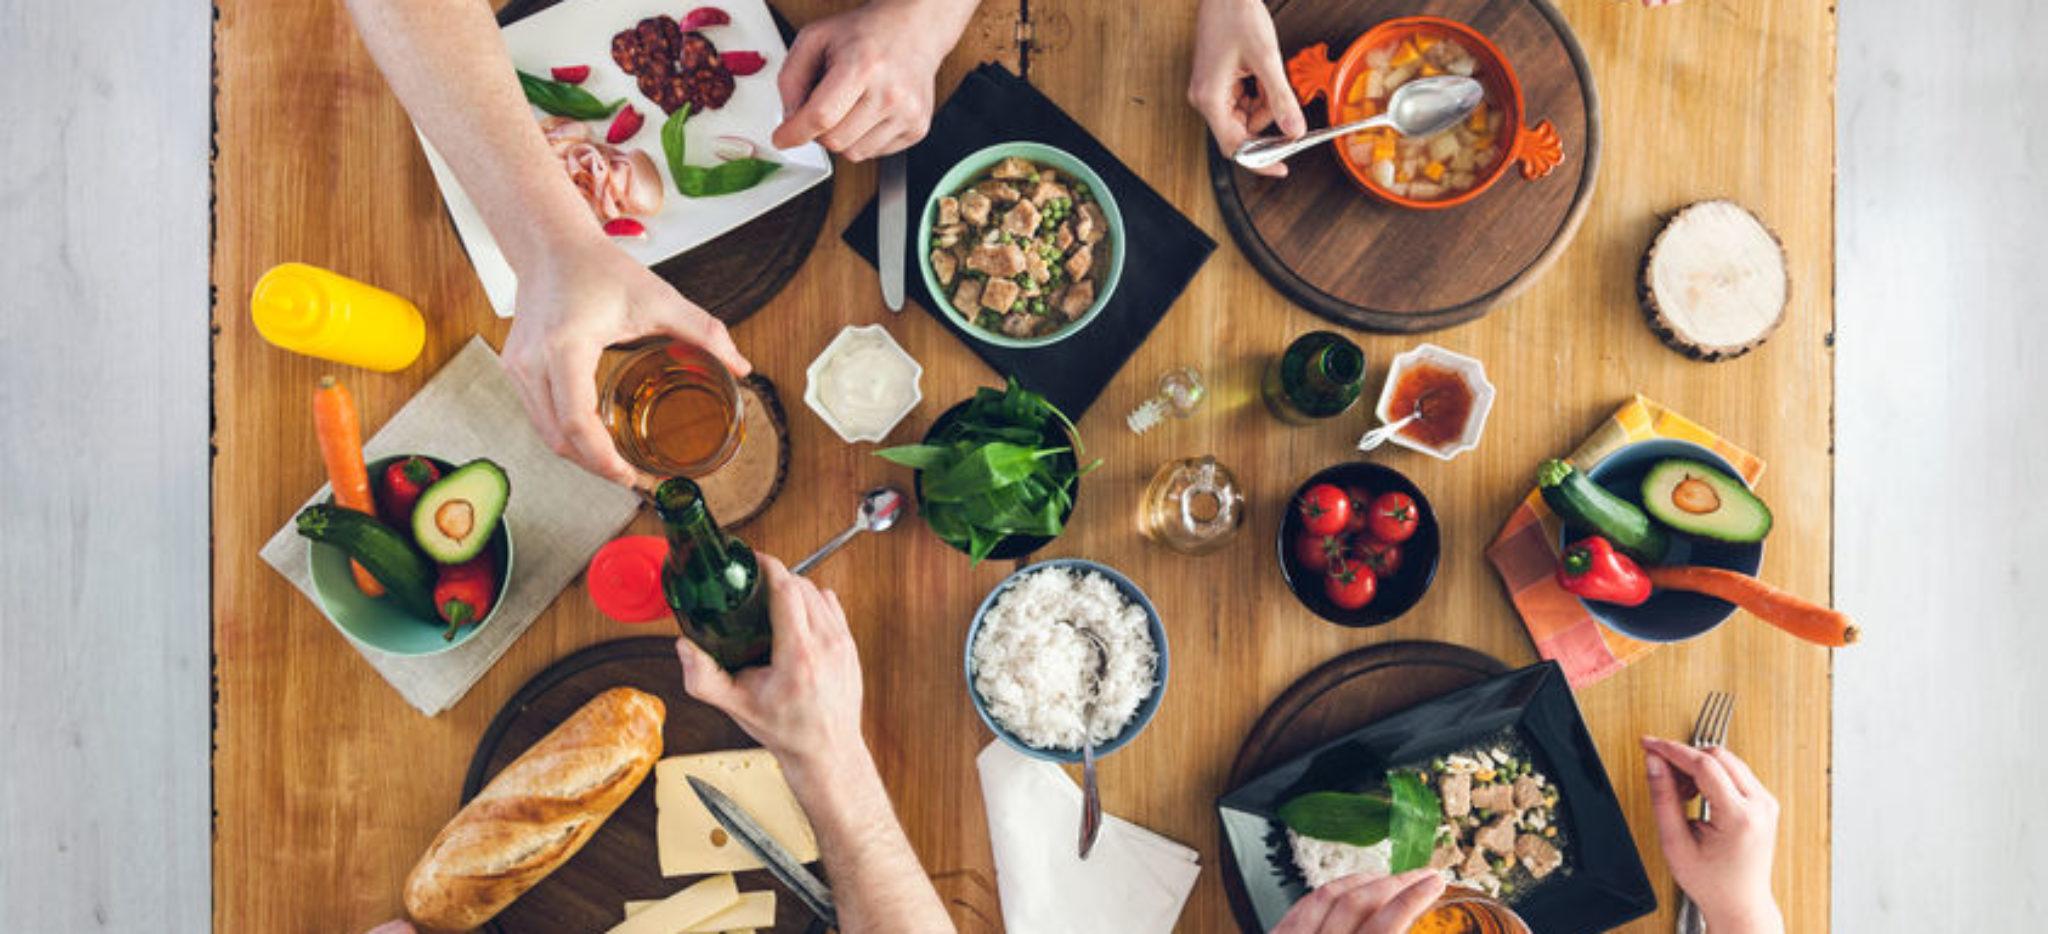 mealtimes in spain